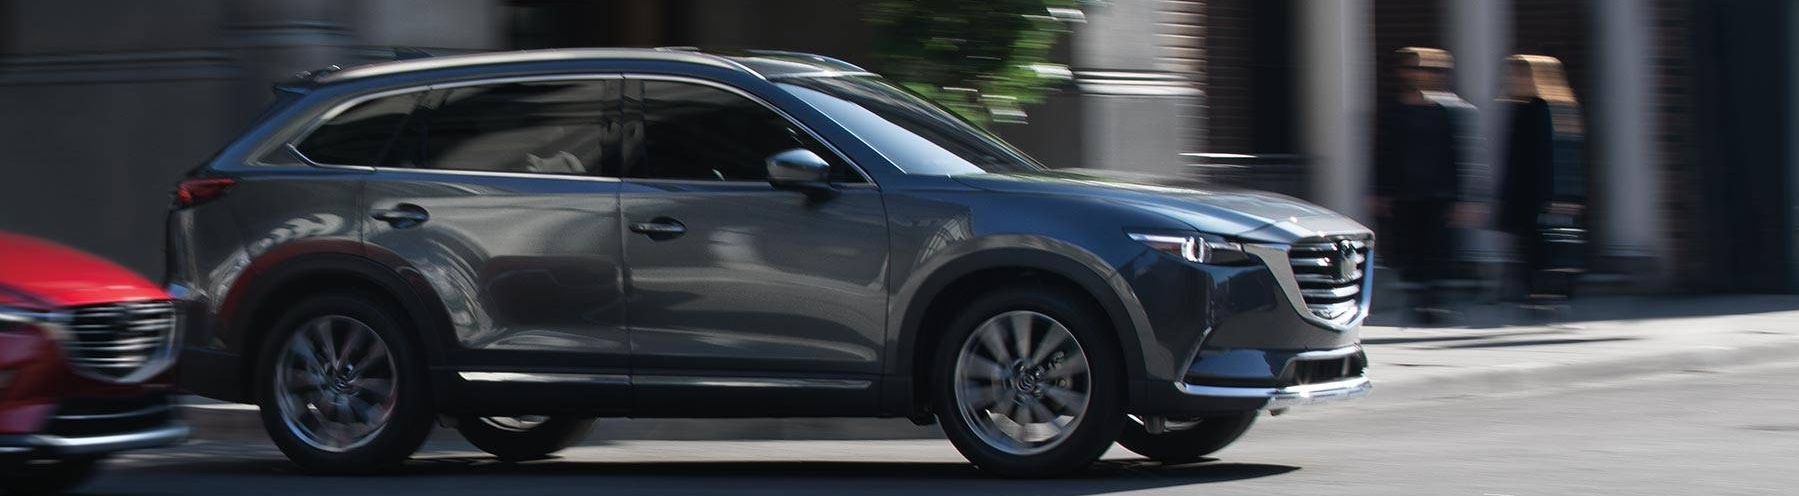 2019 Mazda CX-9 Financing near Roseville, CA